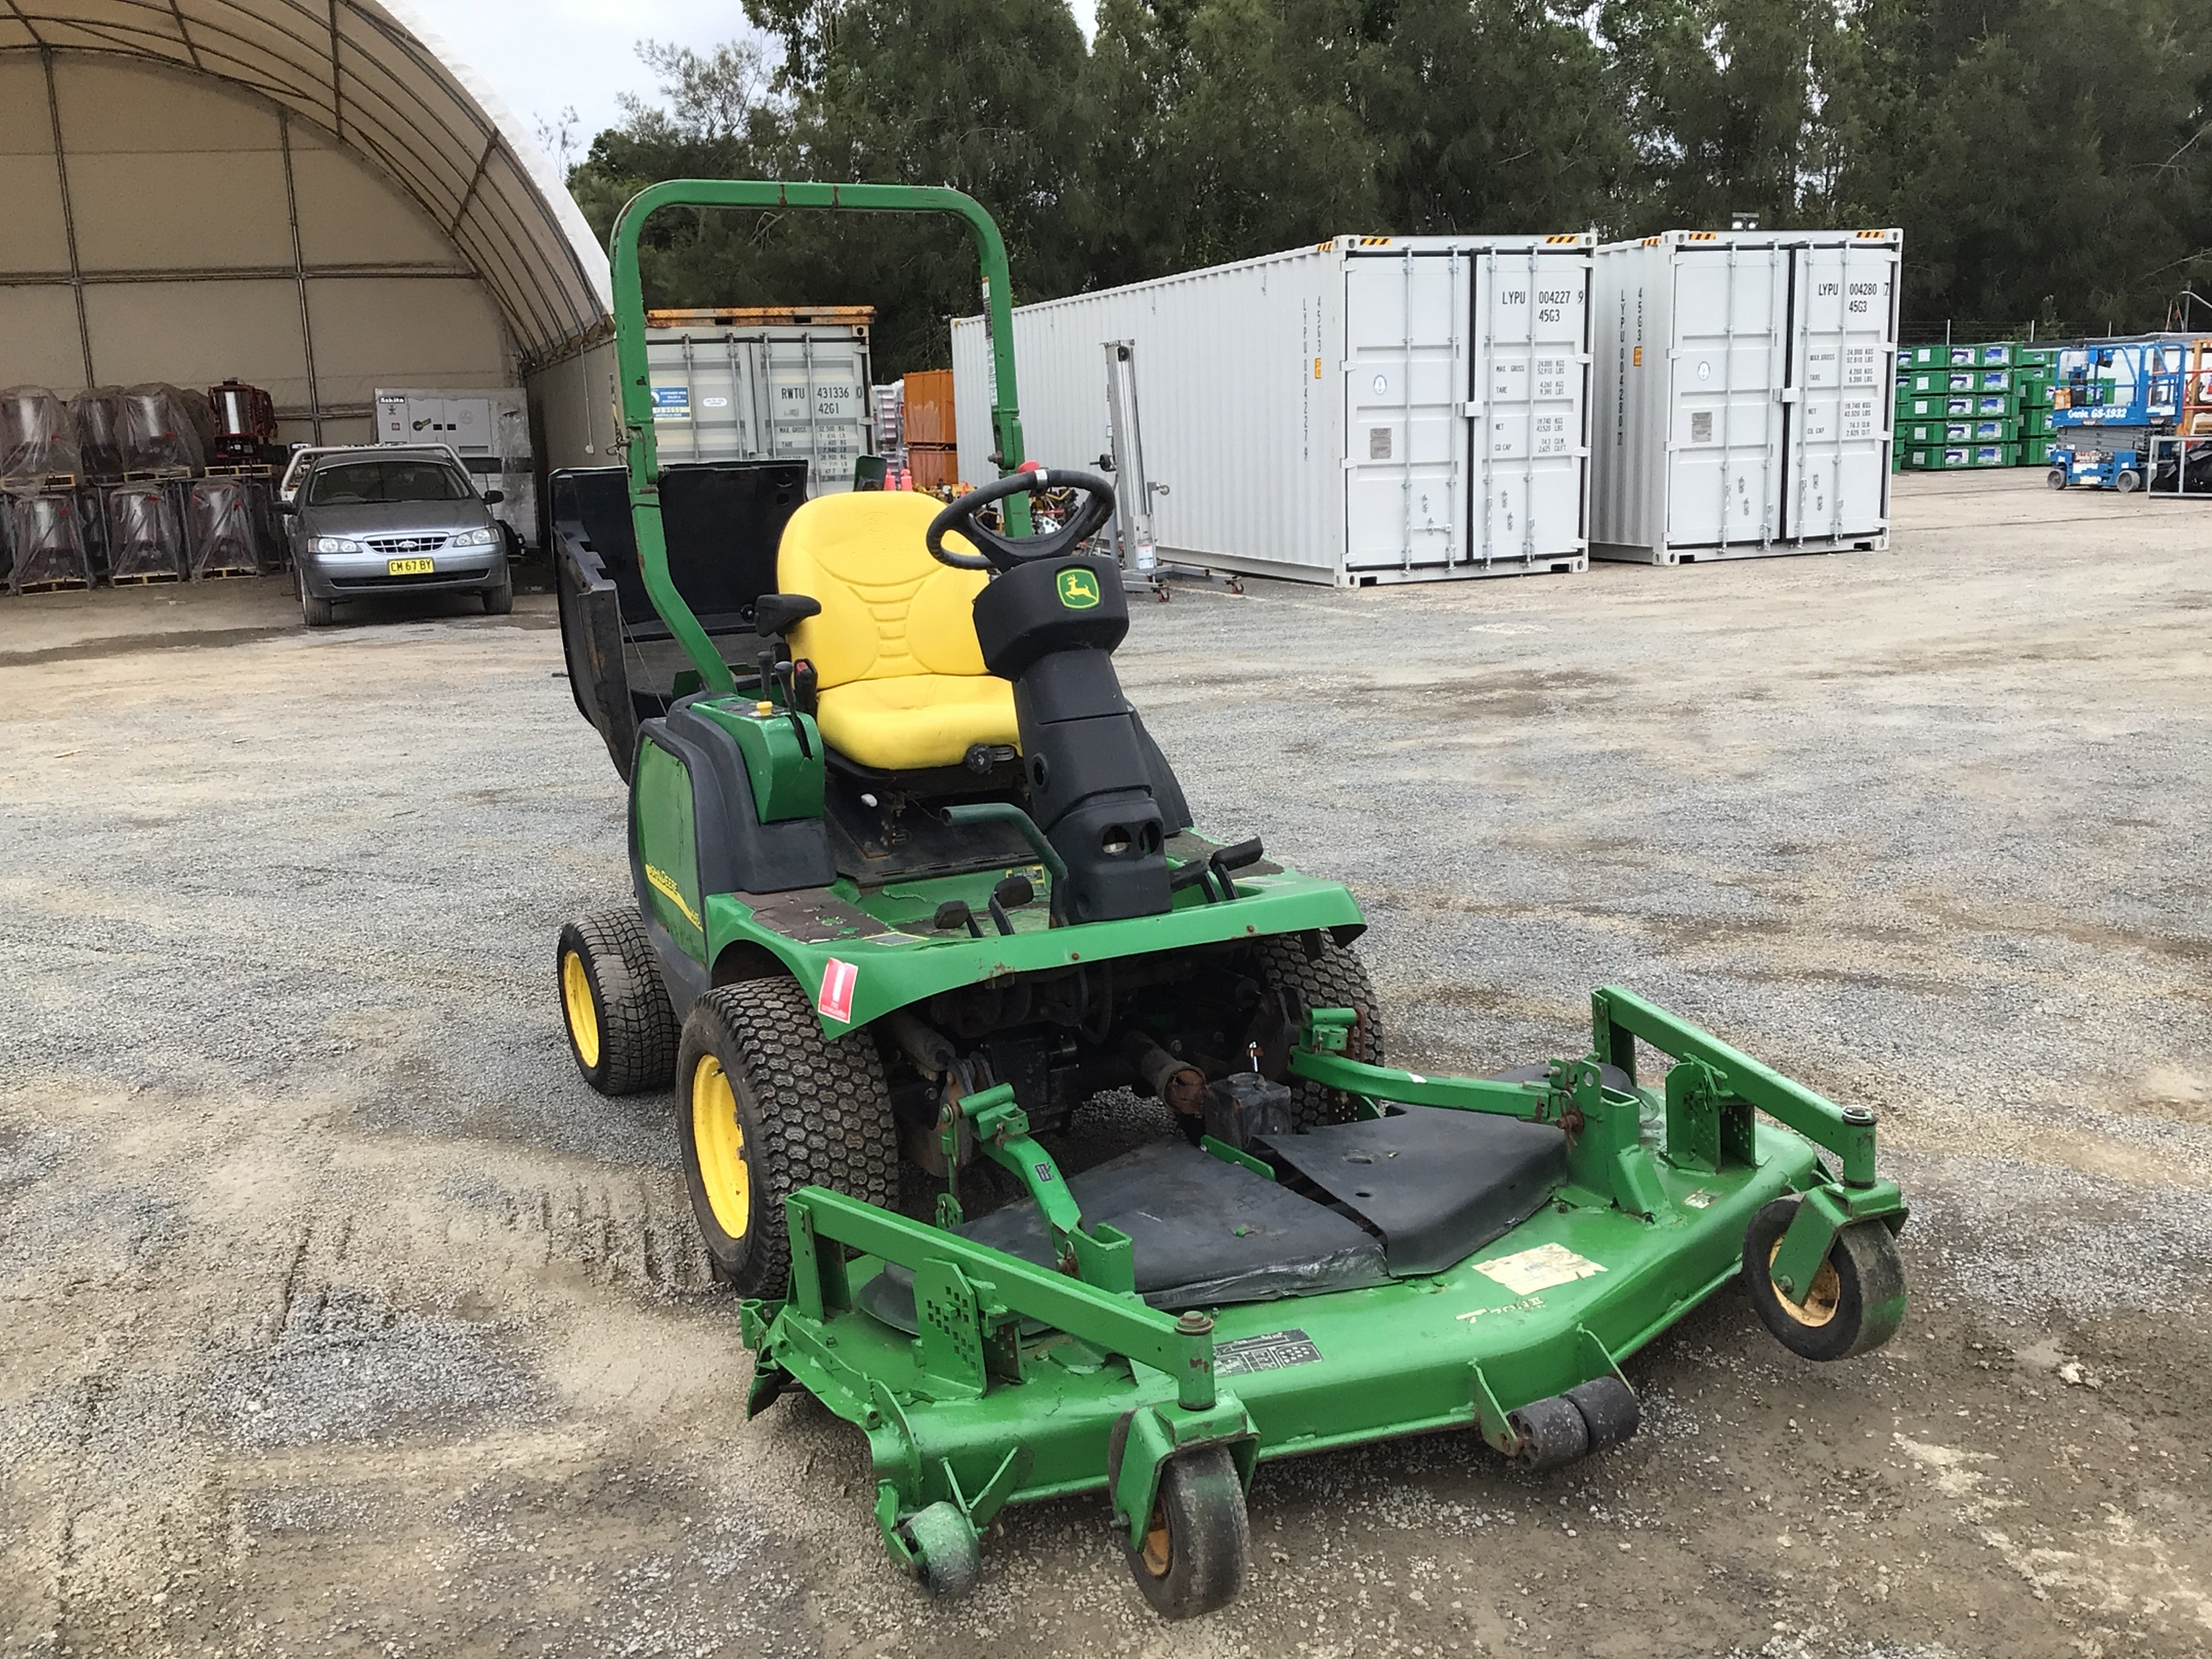 John Deere 1445 Series II 4WD Ride On Lawn Mower